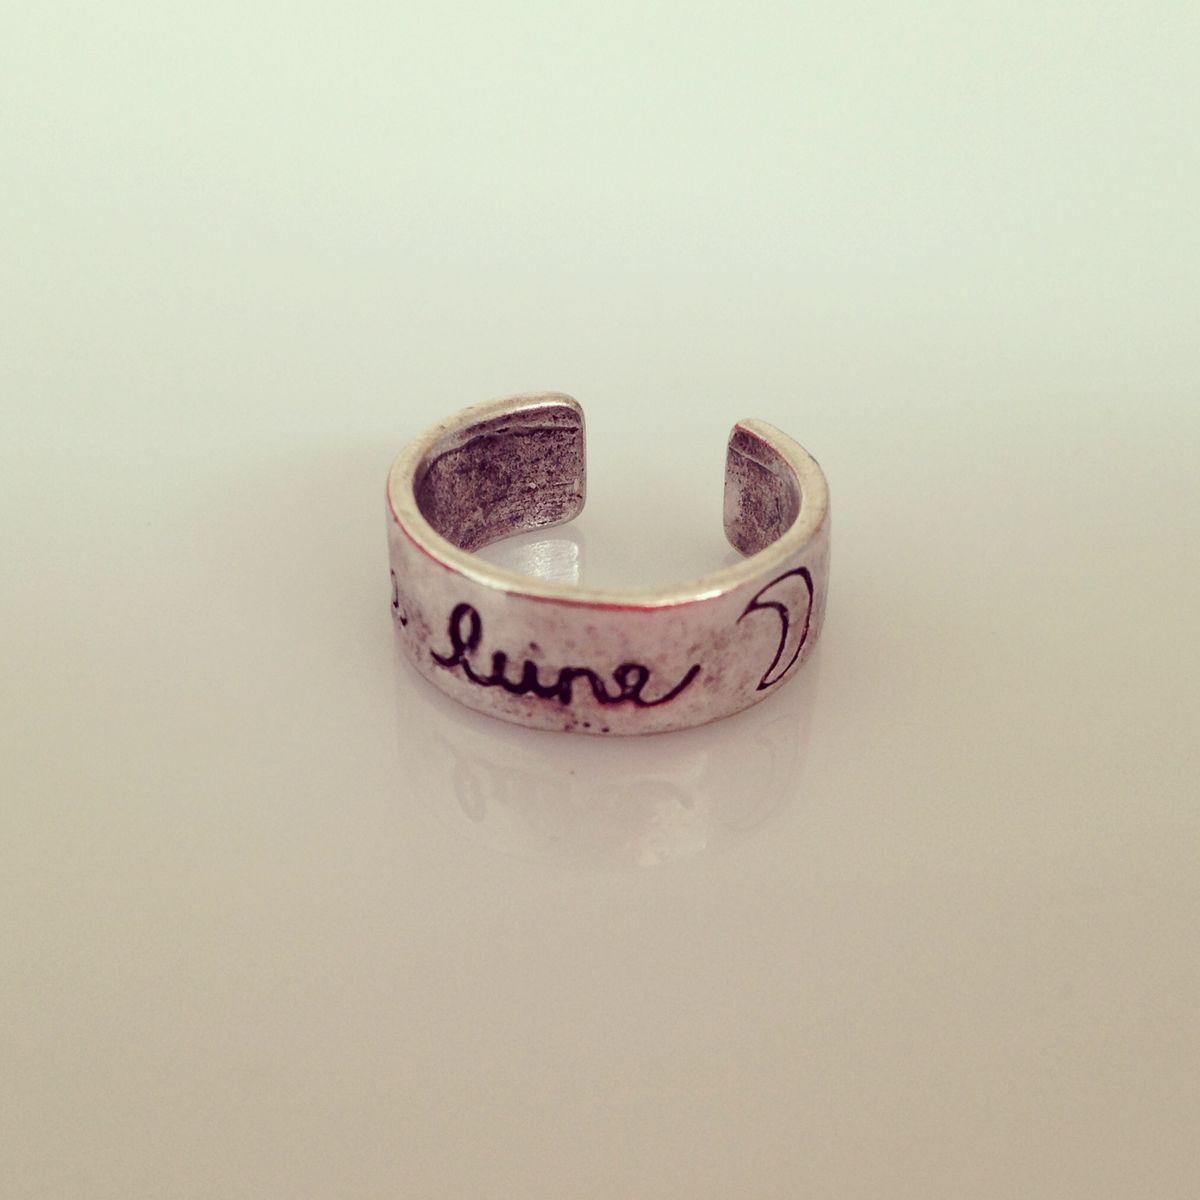 La Lune Midi Ring - ✝ ☪ ☯ ▲ Dollface London Online Jewellery Boutique ▲ ☯ ☪ ✝